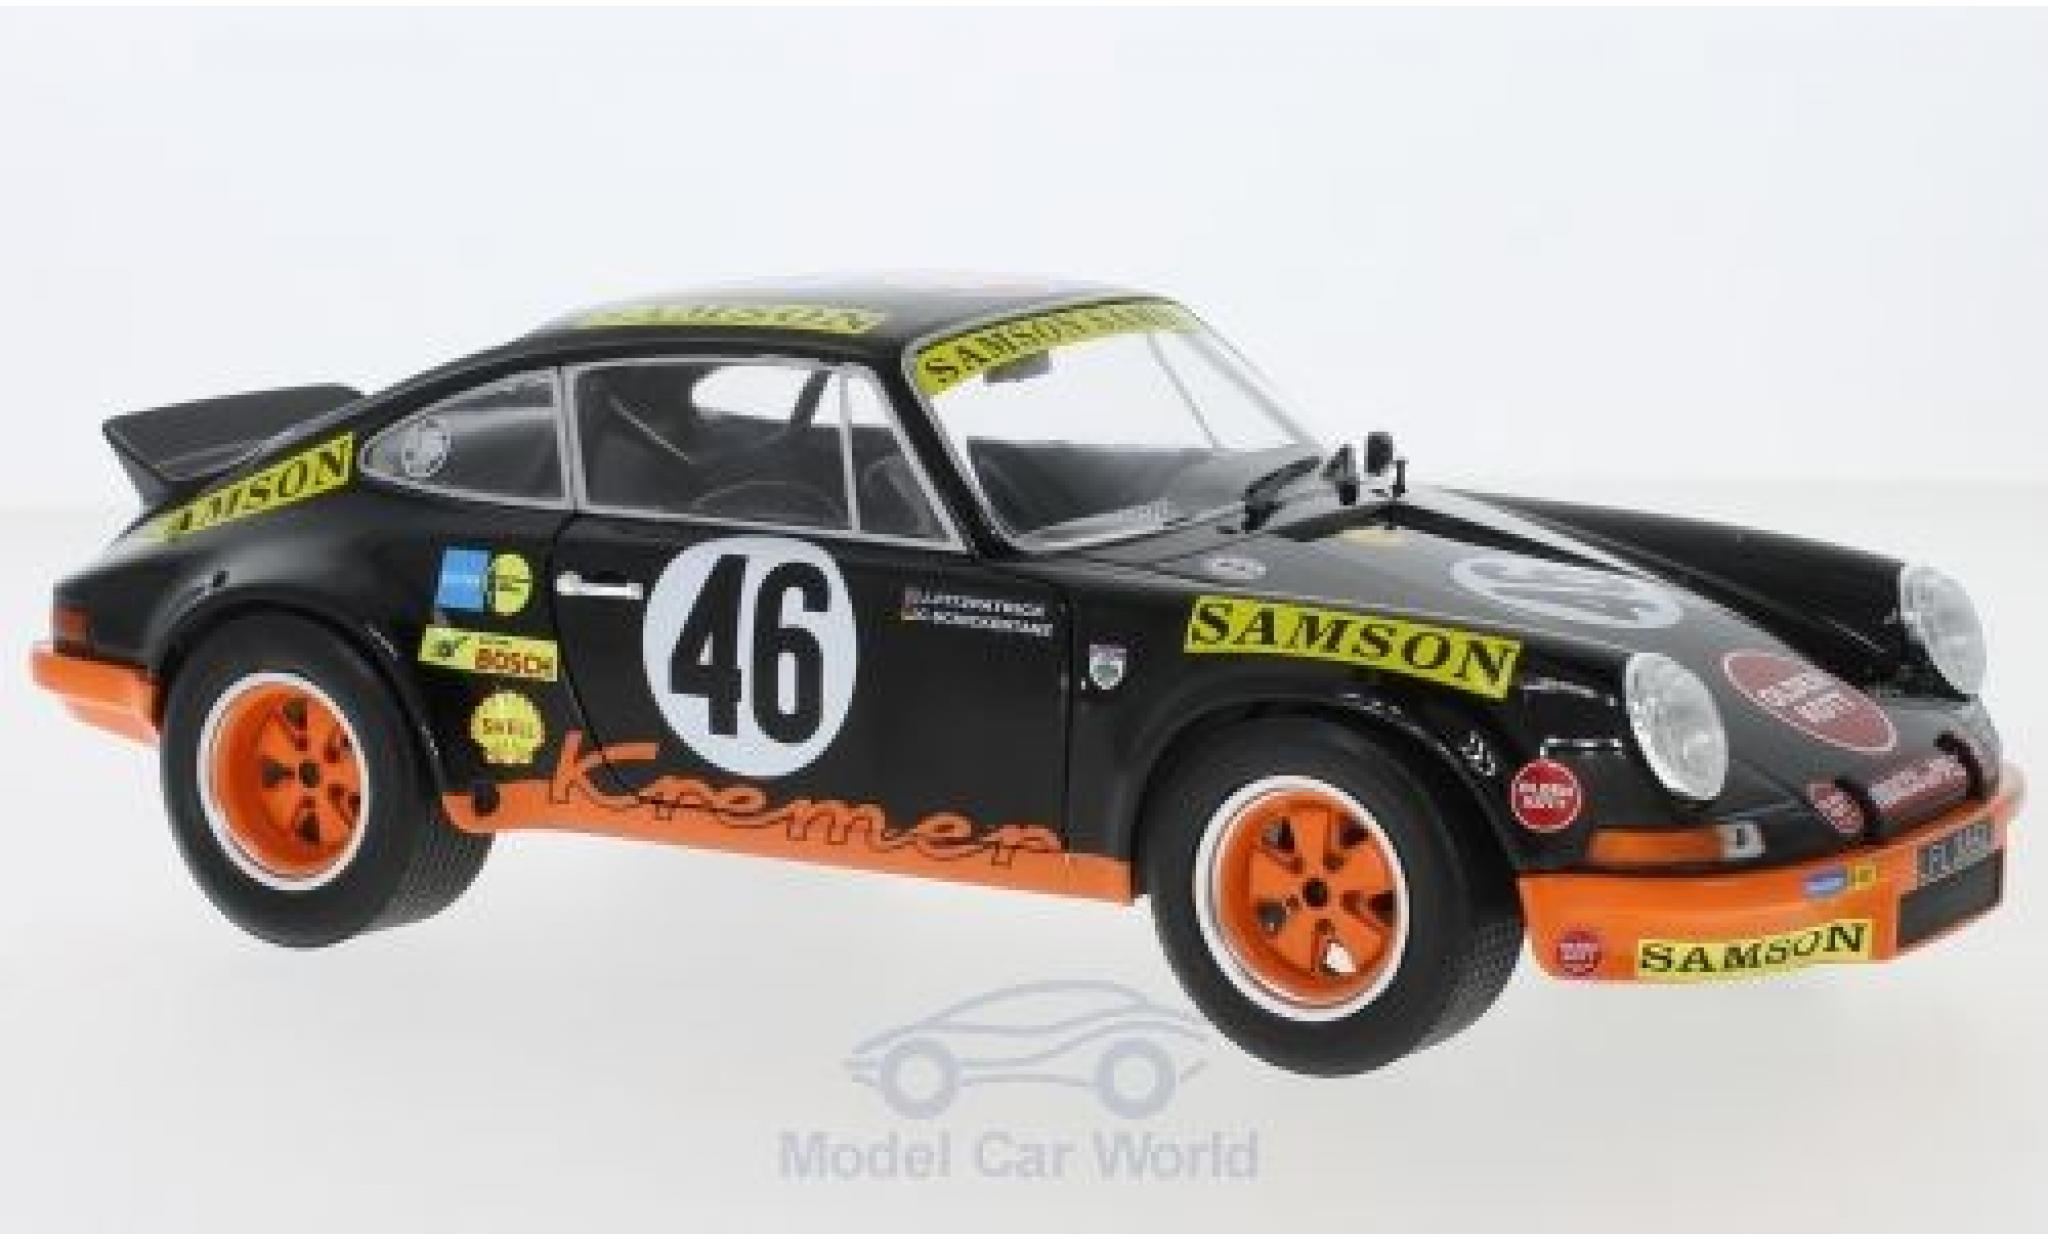 Porsche 911 1/18 Solido RSR No.46 Kremer Samson 1000 Km Spa 1973 J.Fitzpatrick/C.Schickentanz